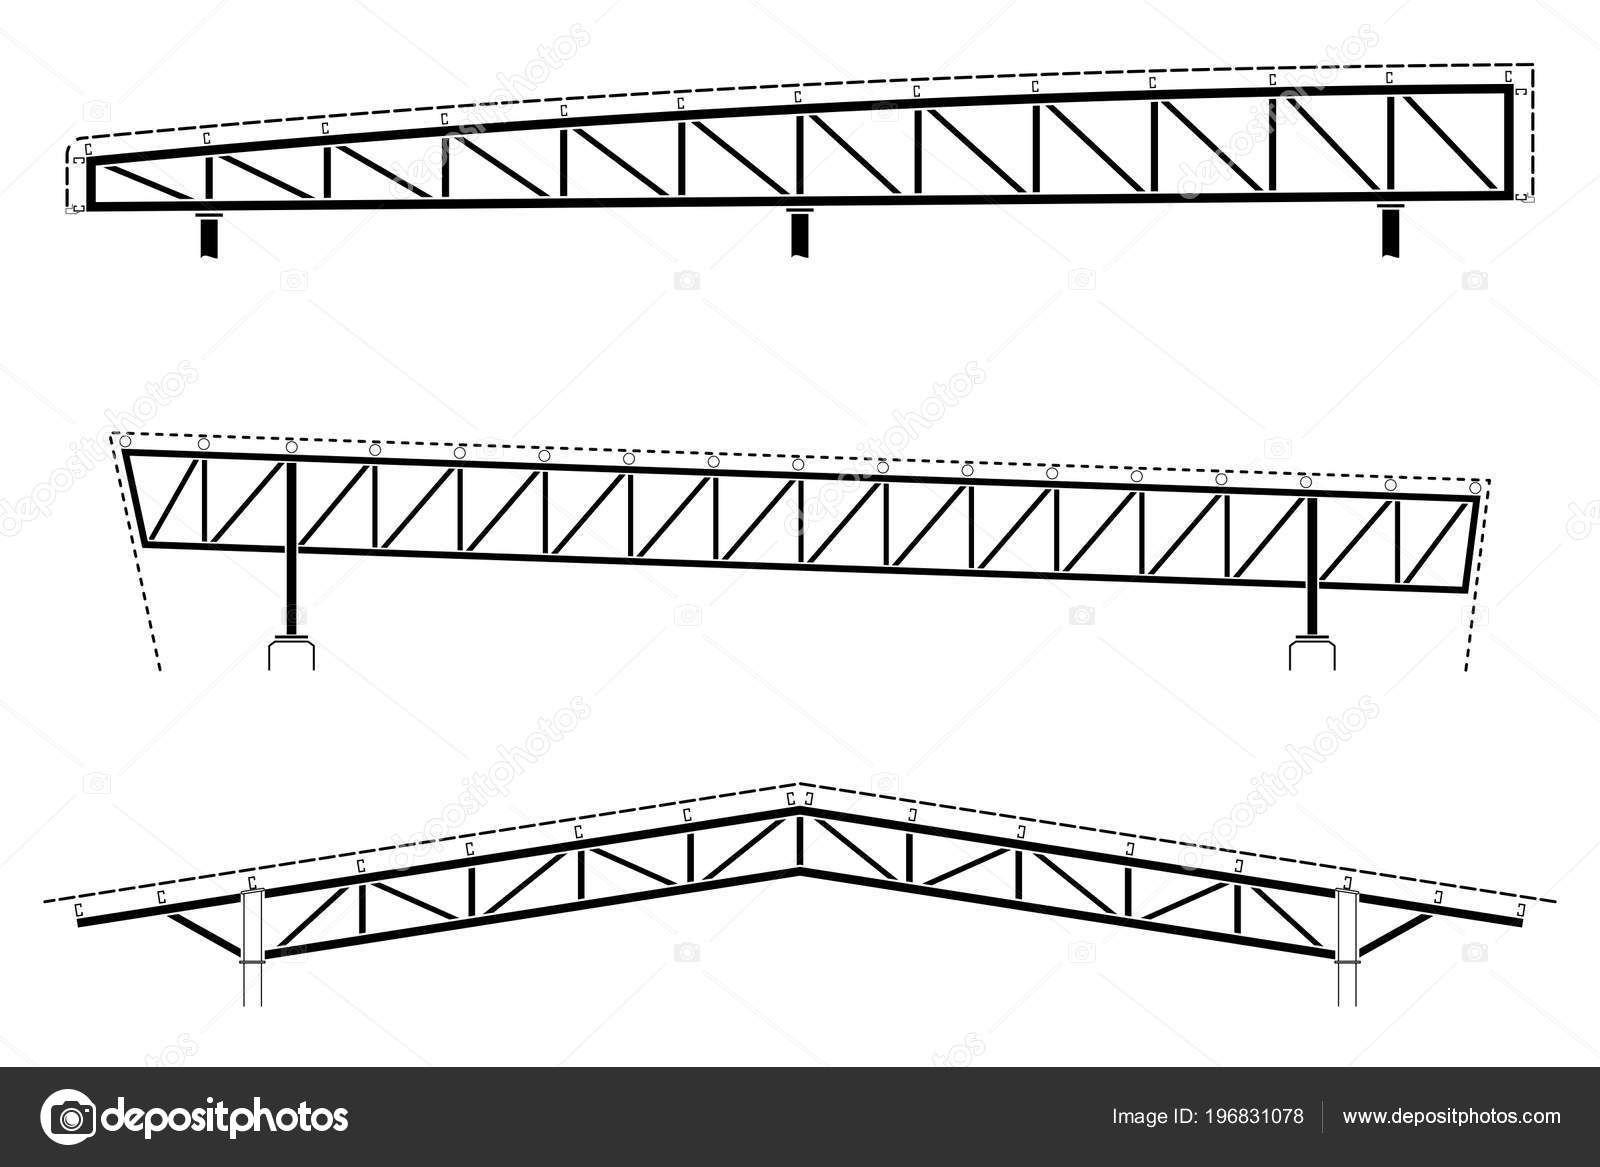 Download Roofing Building Steel Frame Detail Roof Truss Set Vector Illustration Stock Illustration In 2020 Building Roof Roof Trusses Steel Trusses